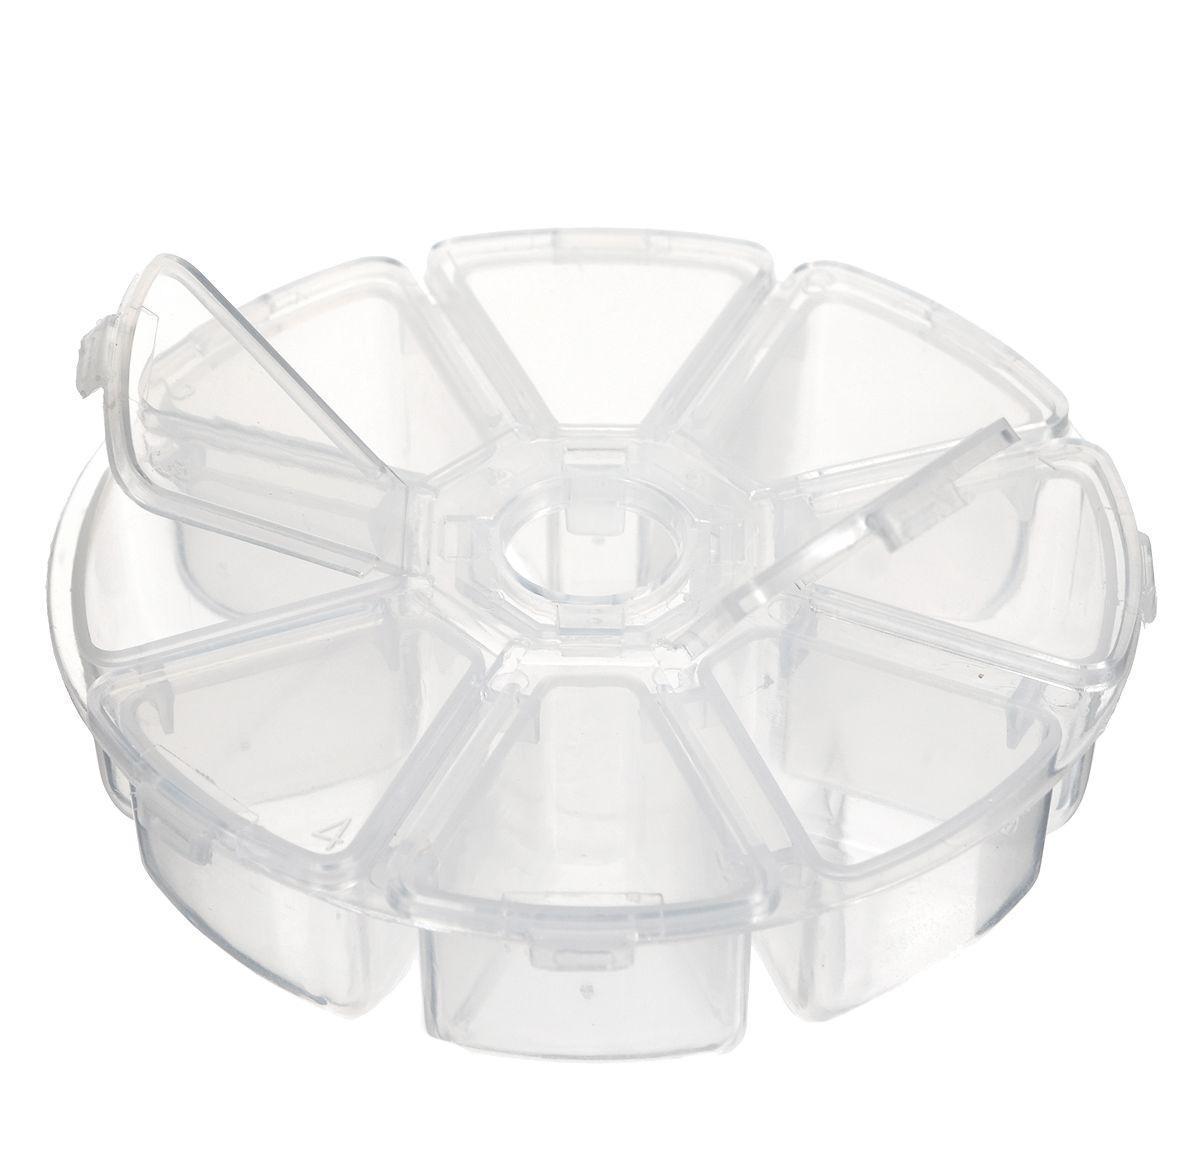 Контейнер для бисера Hobby & Pro, 8 секций, диаметр 10 см контейнер для мелочей hobby